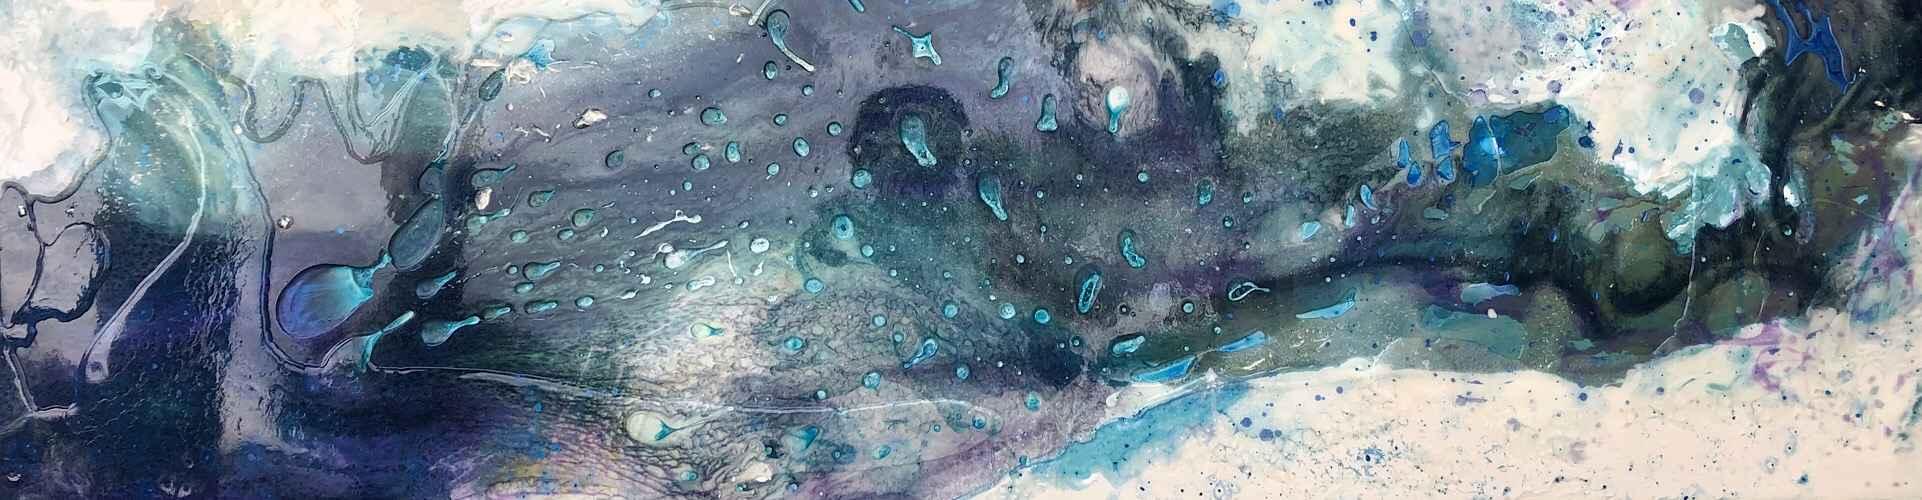 Stargazer by  Brendan Parker - Masterpiece Online